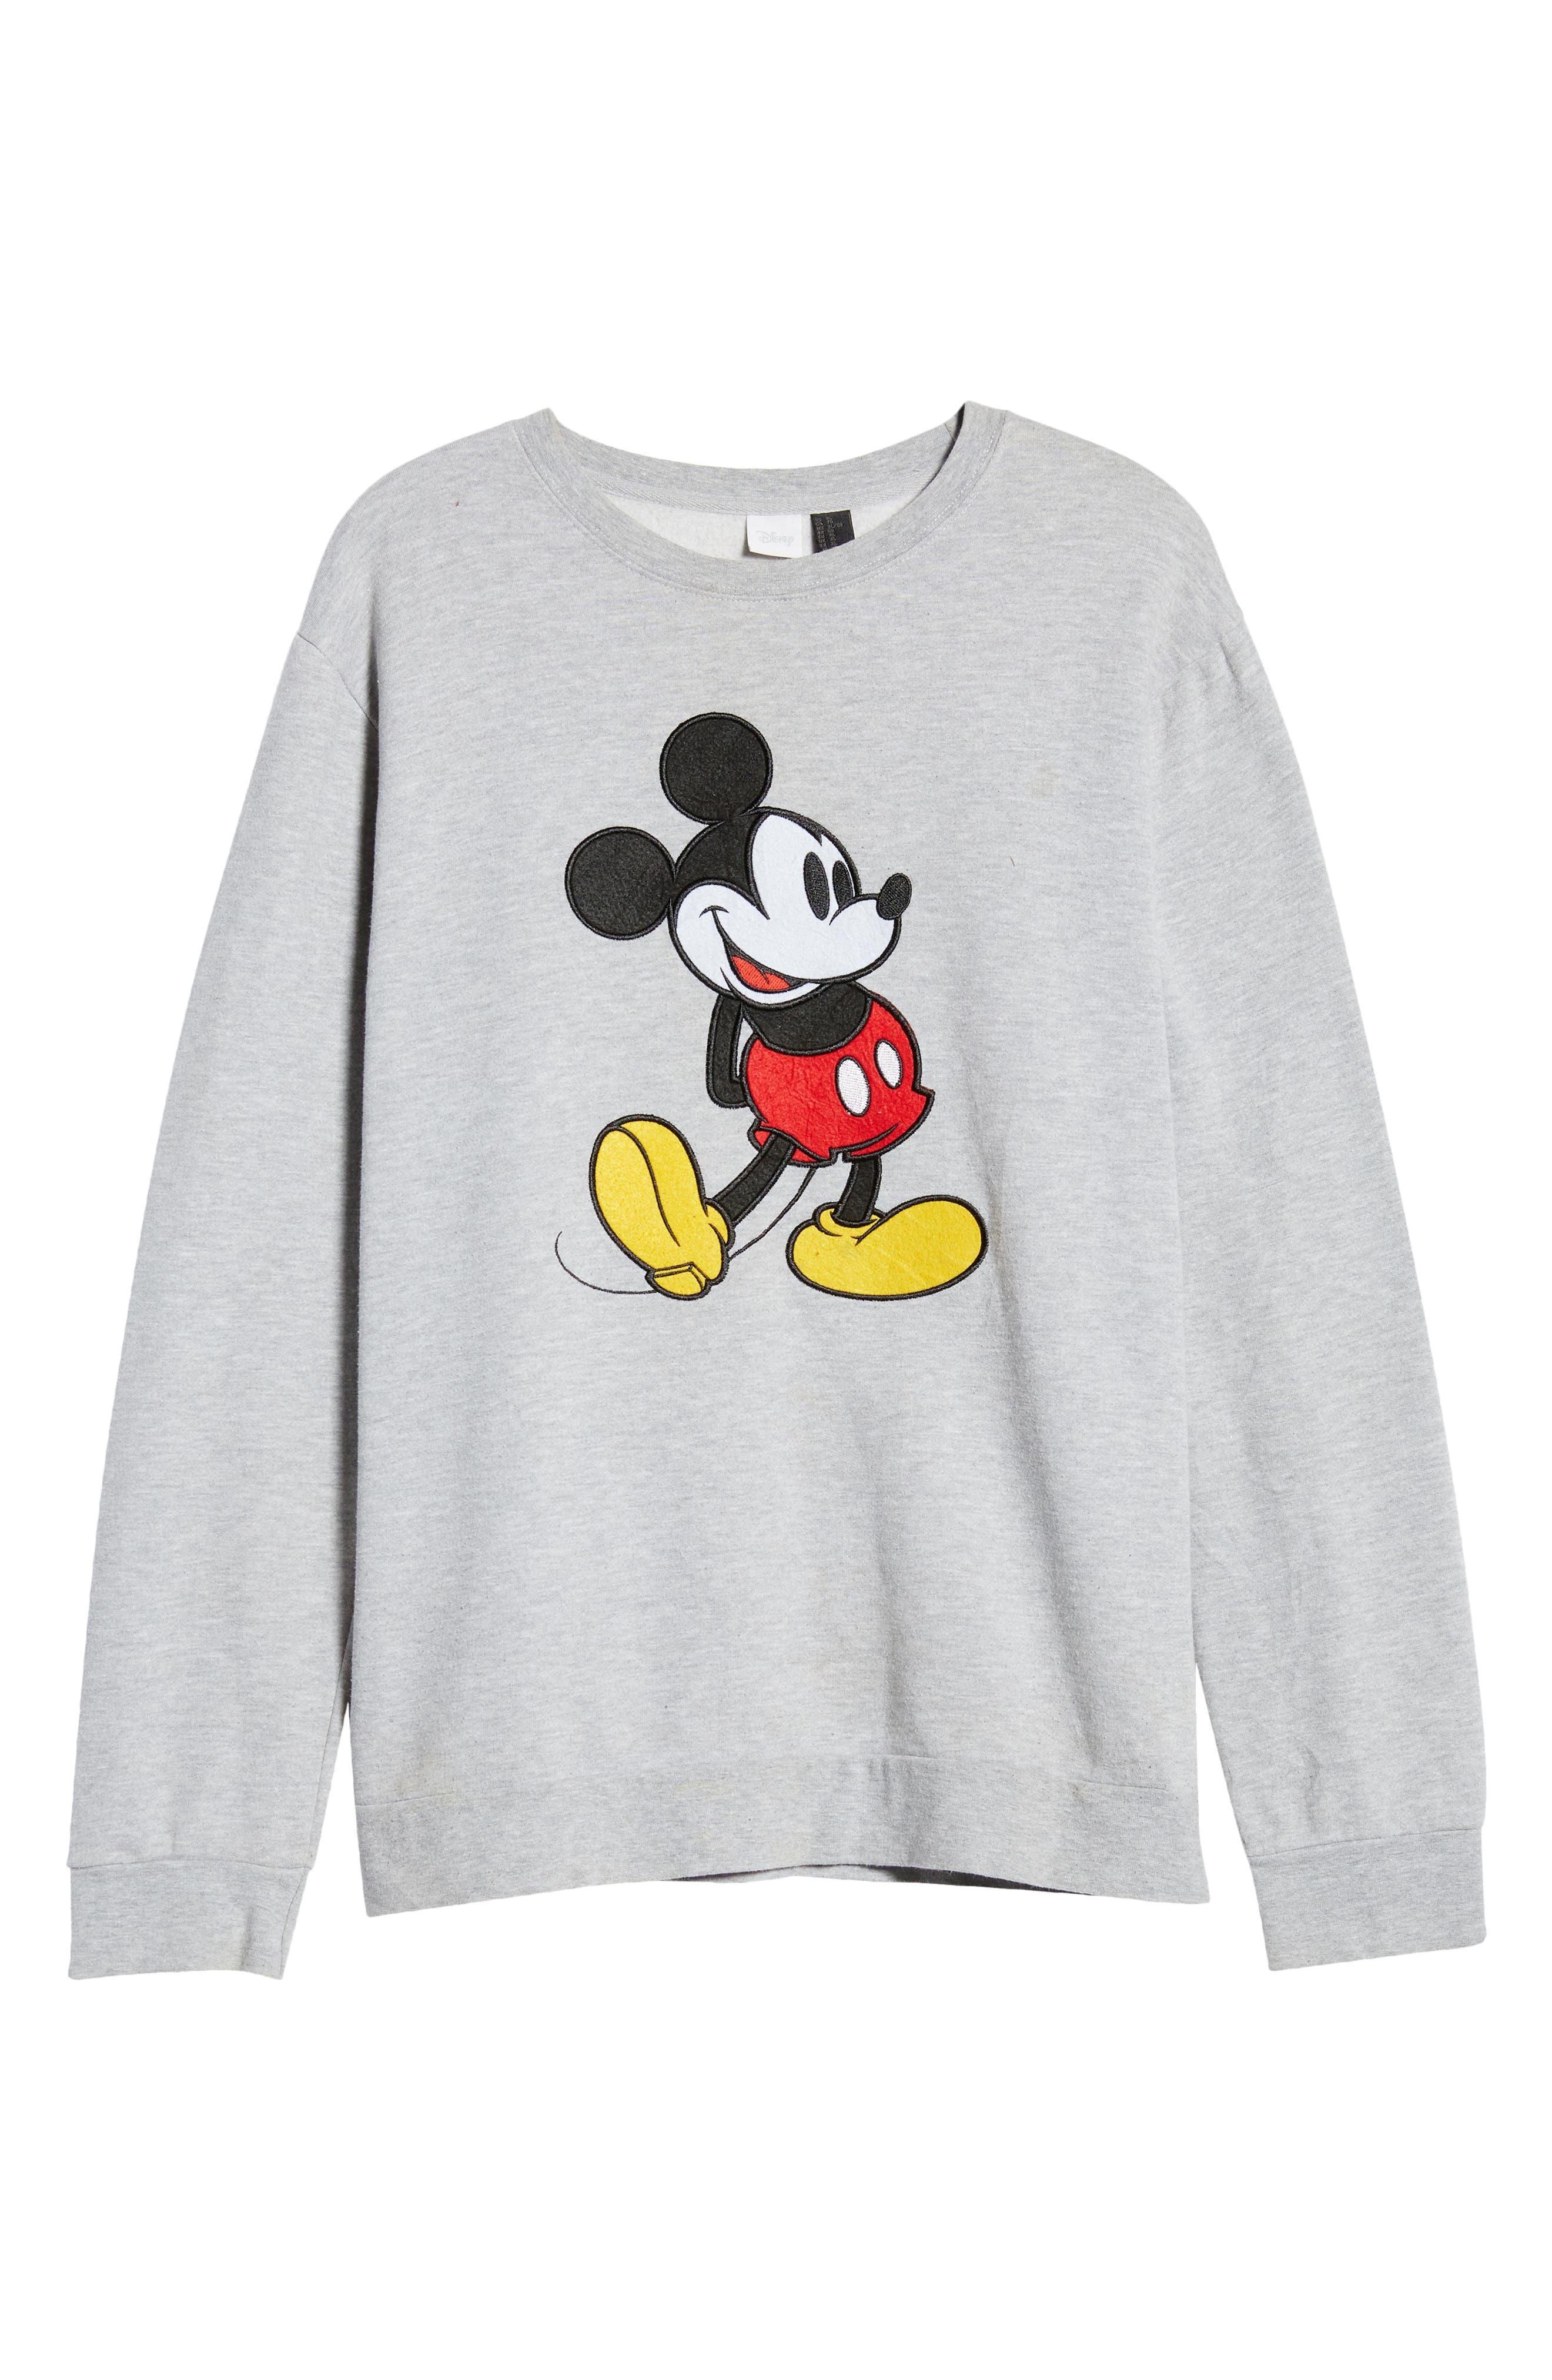 Unisex Secondhand Mickey Embroidered Sweatshirt